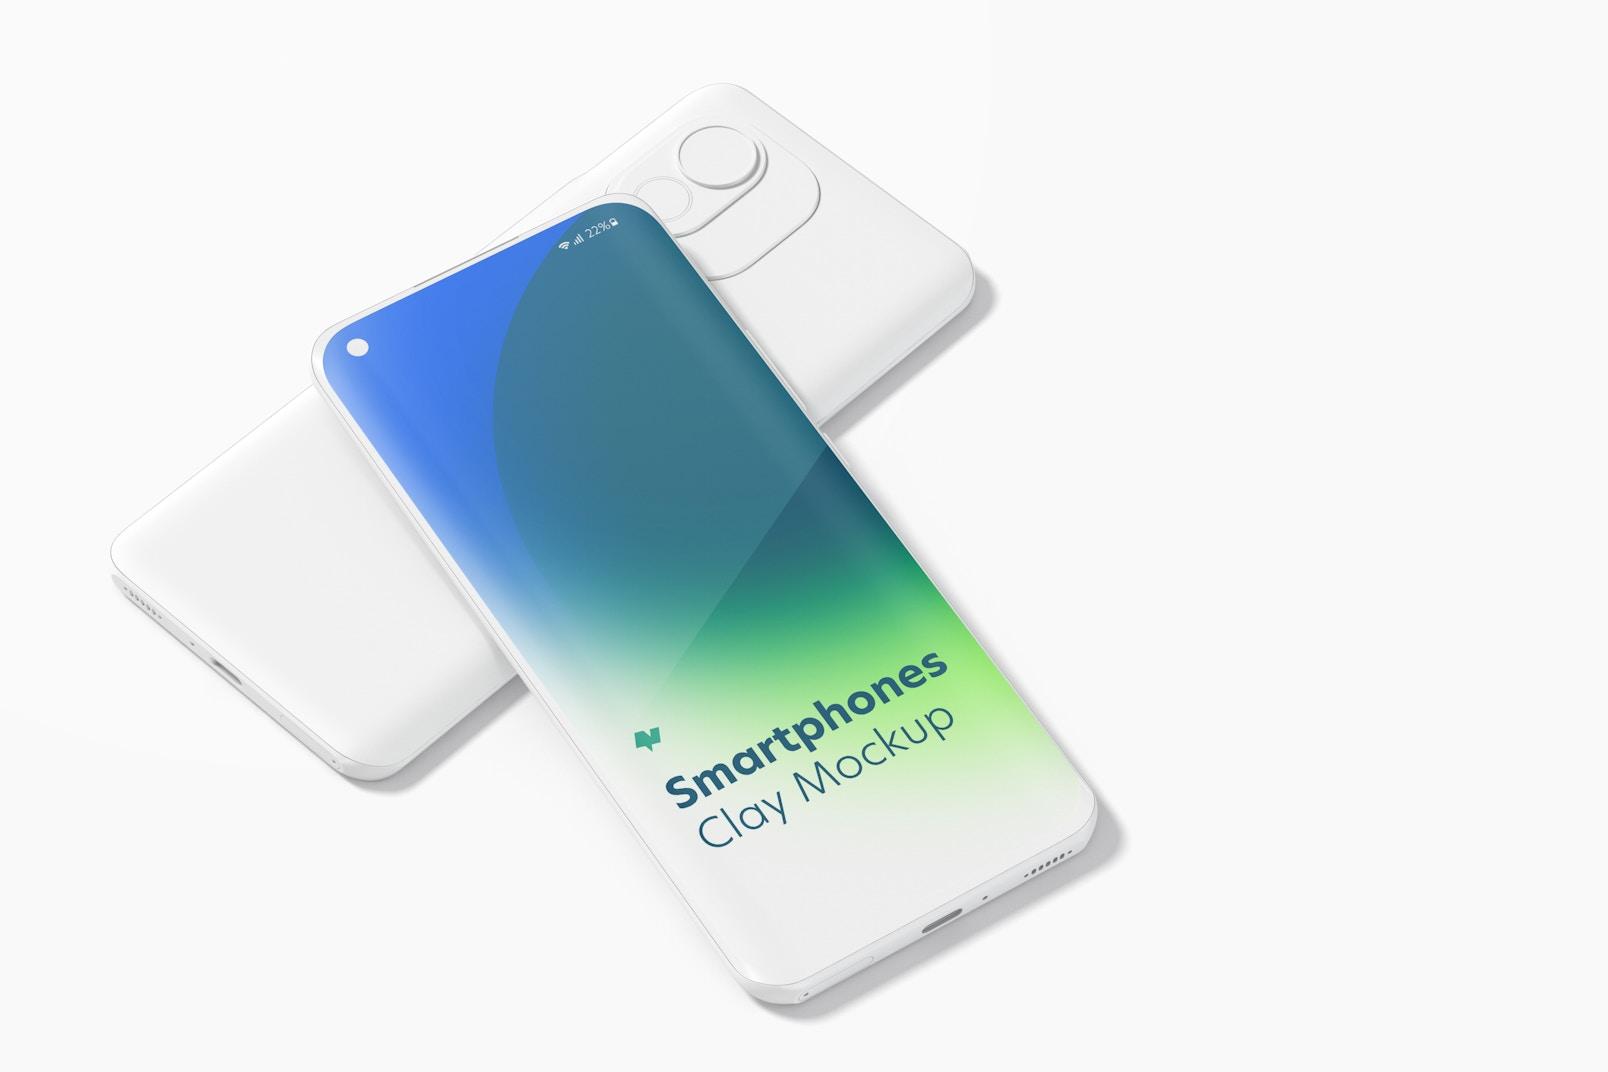 Clay Xiaomi Smartphones Mockup, Perspective